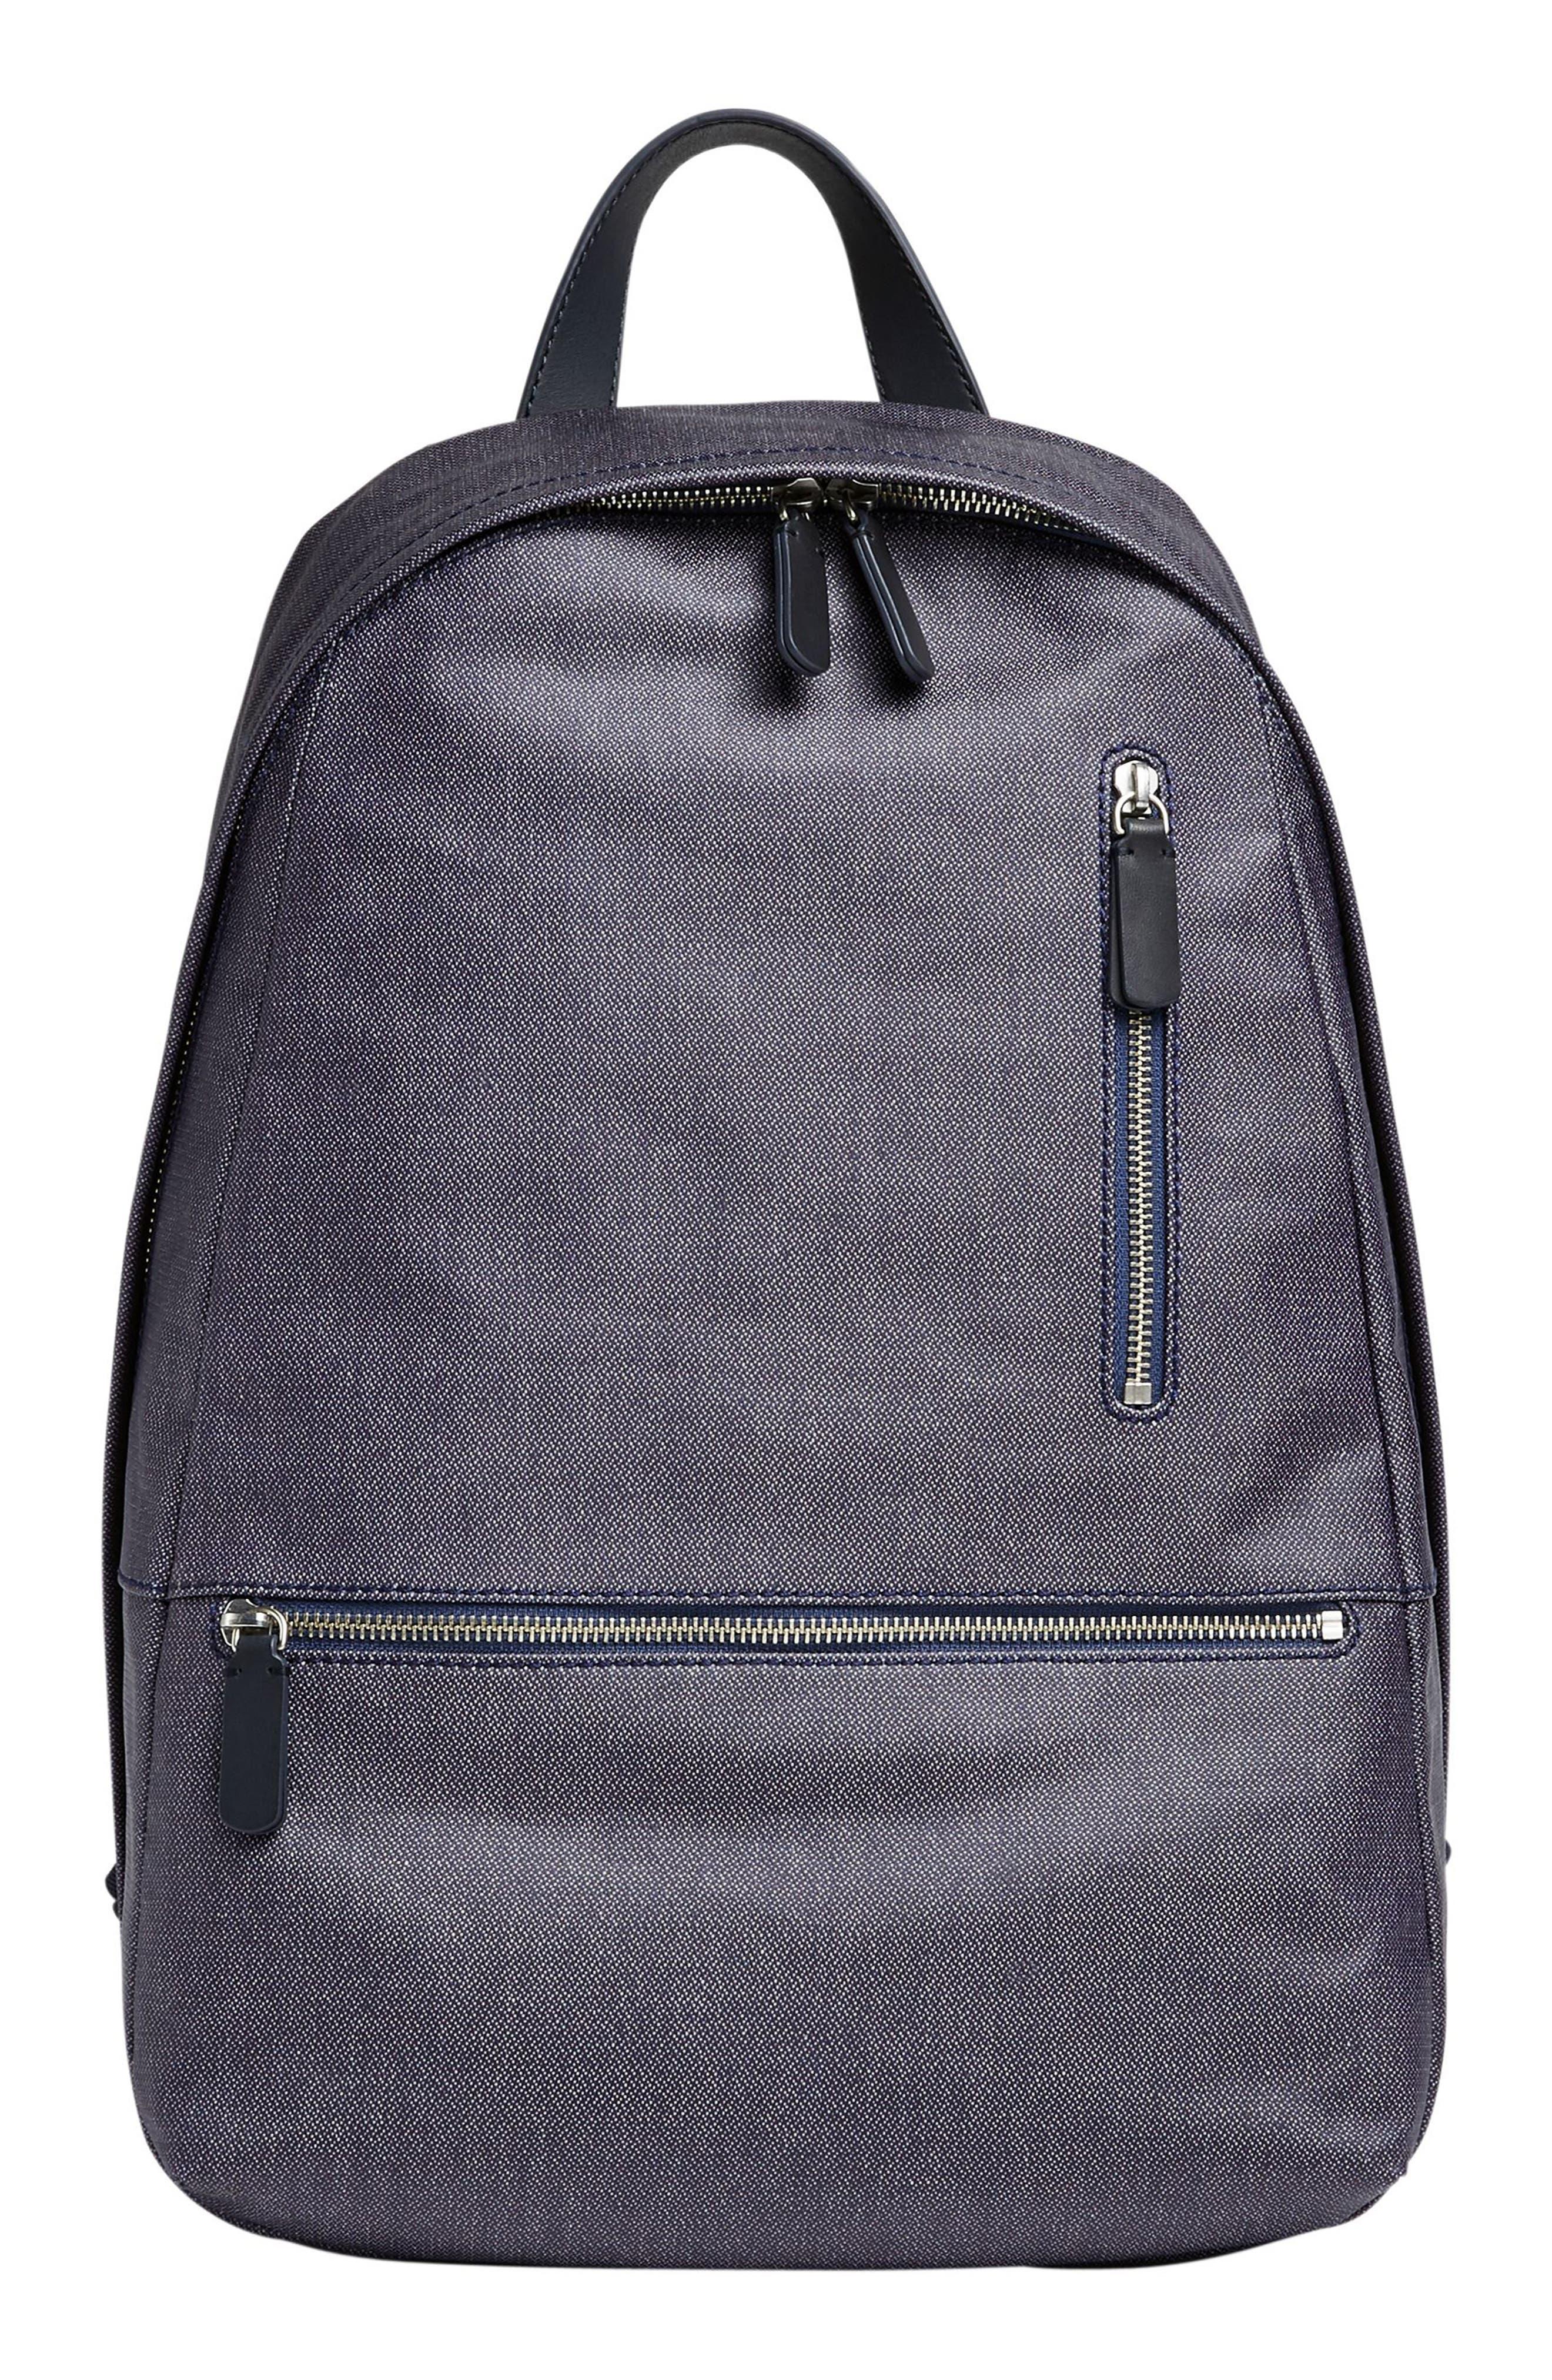 Skagen Kroyer Backpack